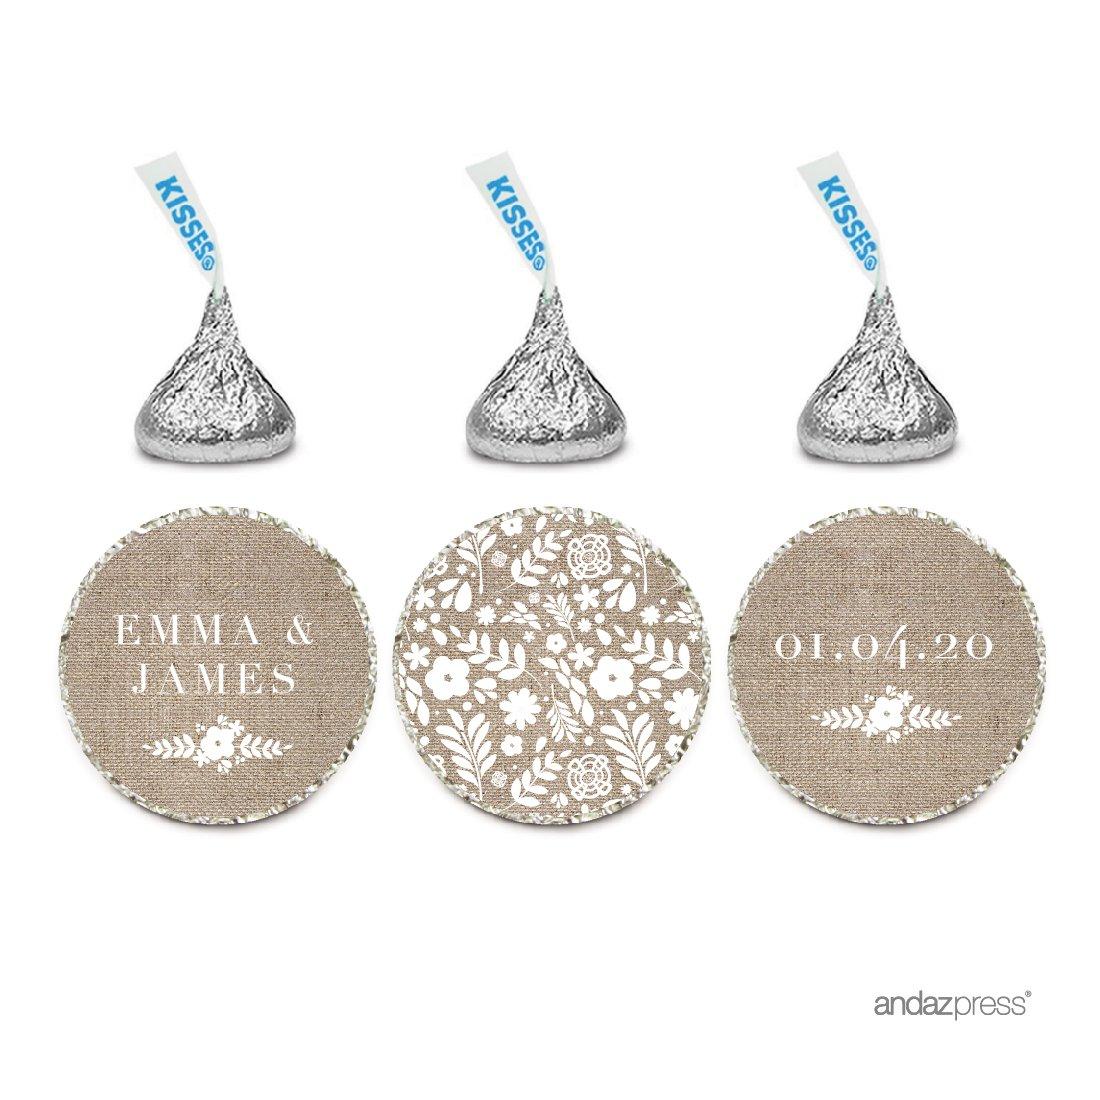 Amazon.com: Andaz Press Personalized Wedding Chocolate Drop Label ...